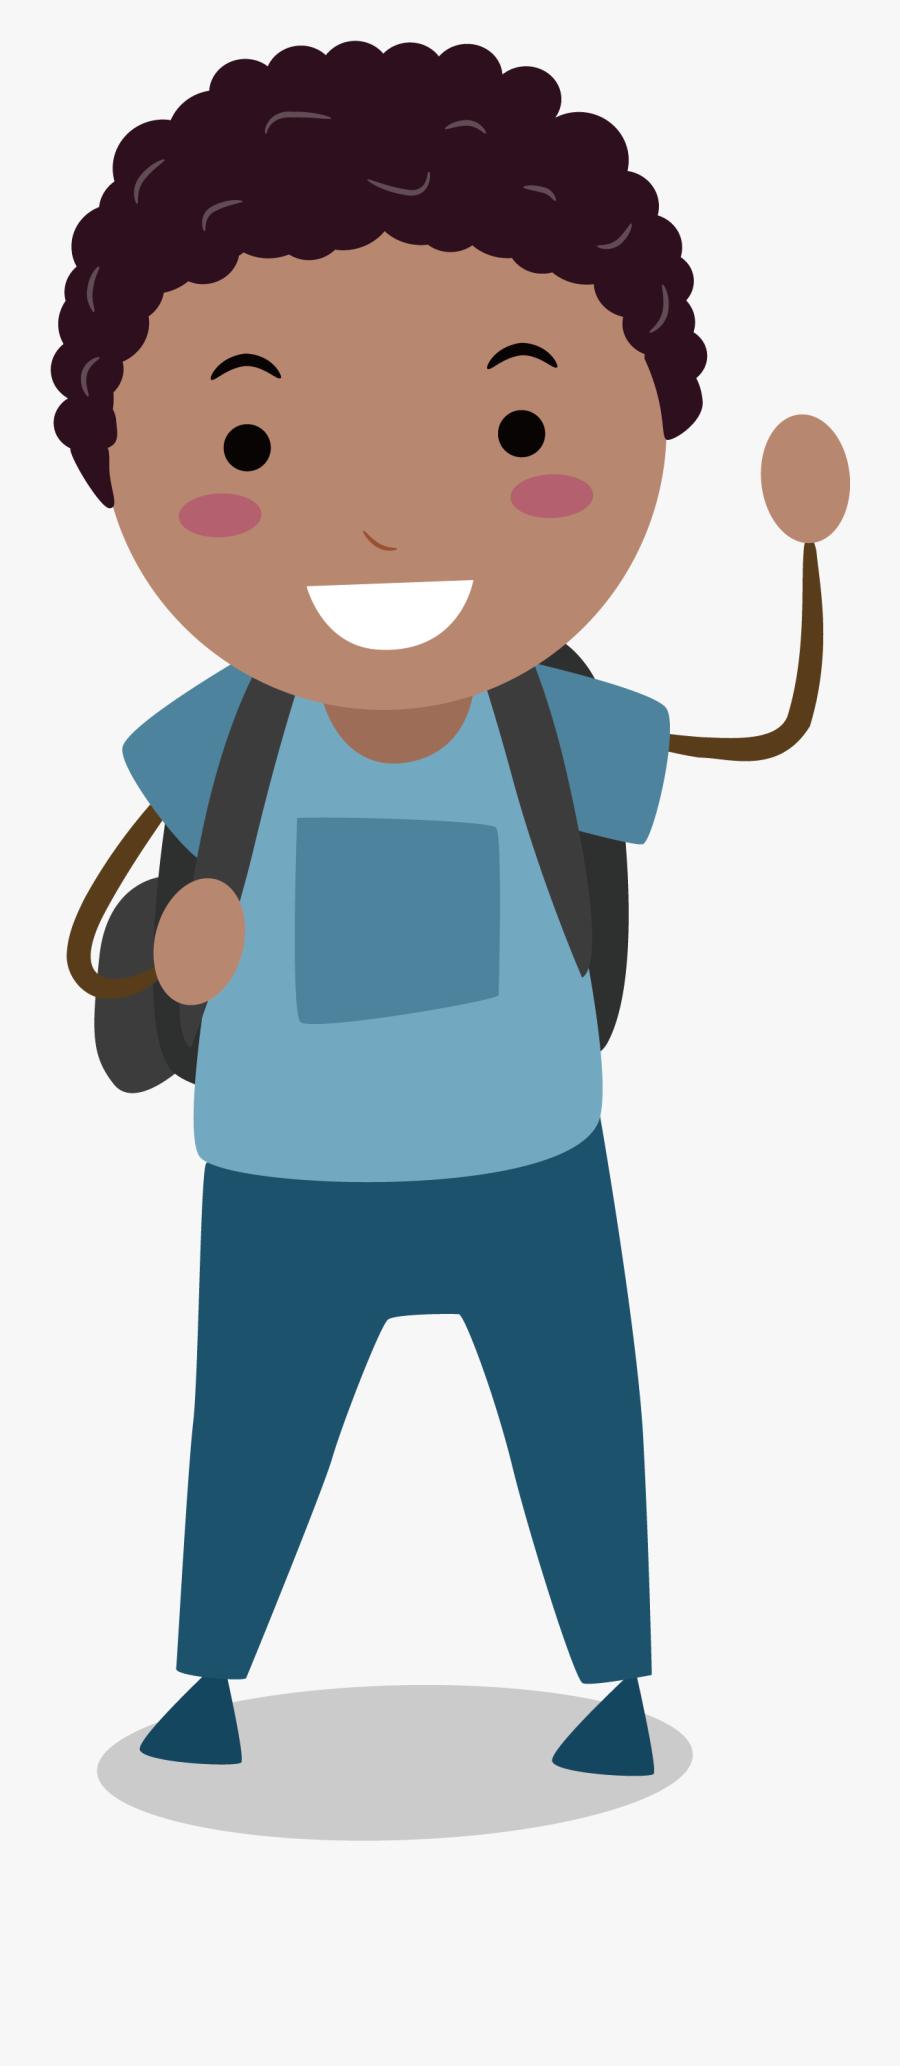 Male Clipart Middle School Boy - Children's Animated, Transparent Clipart